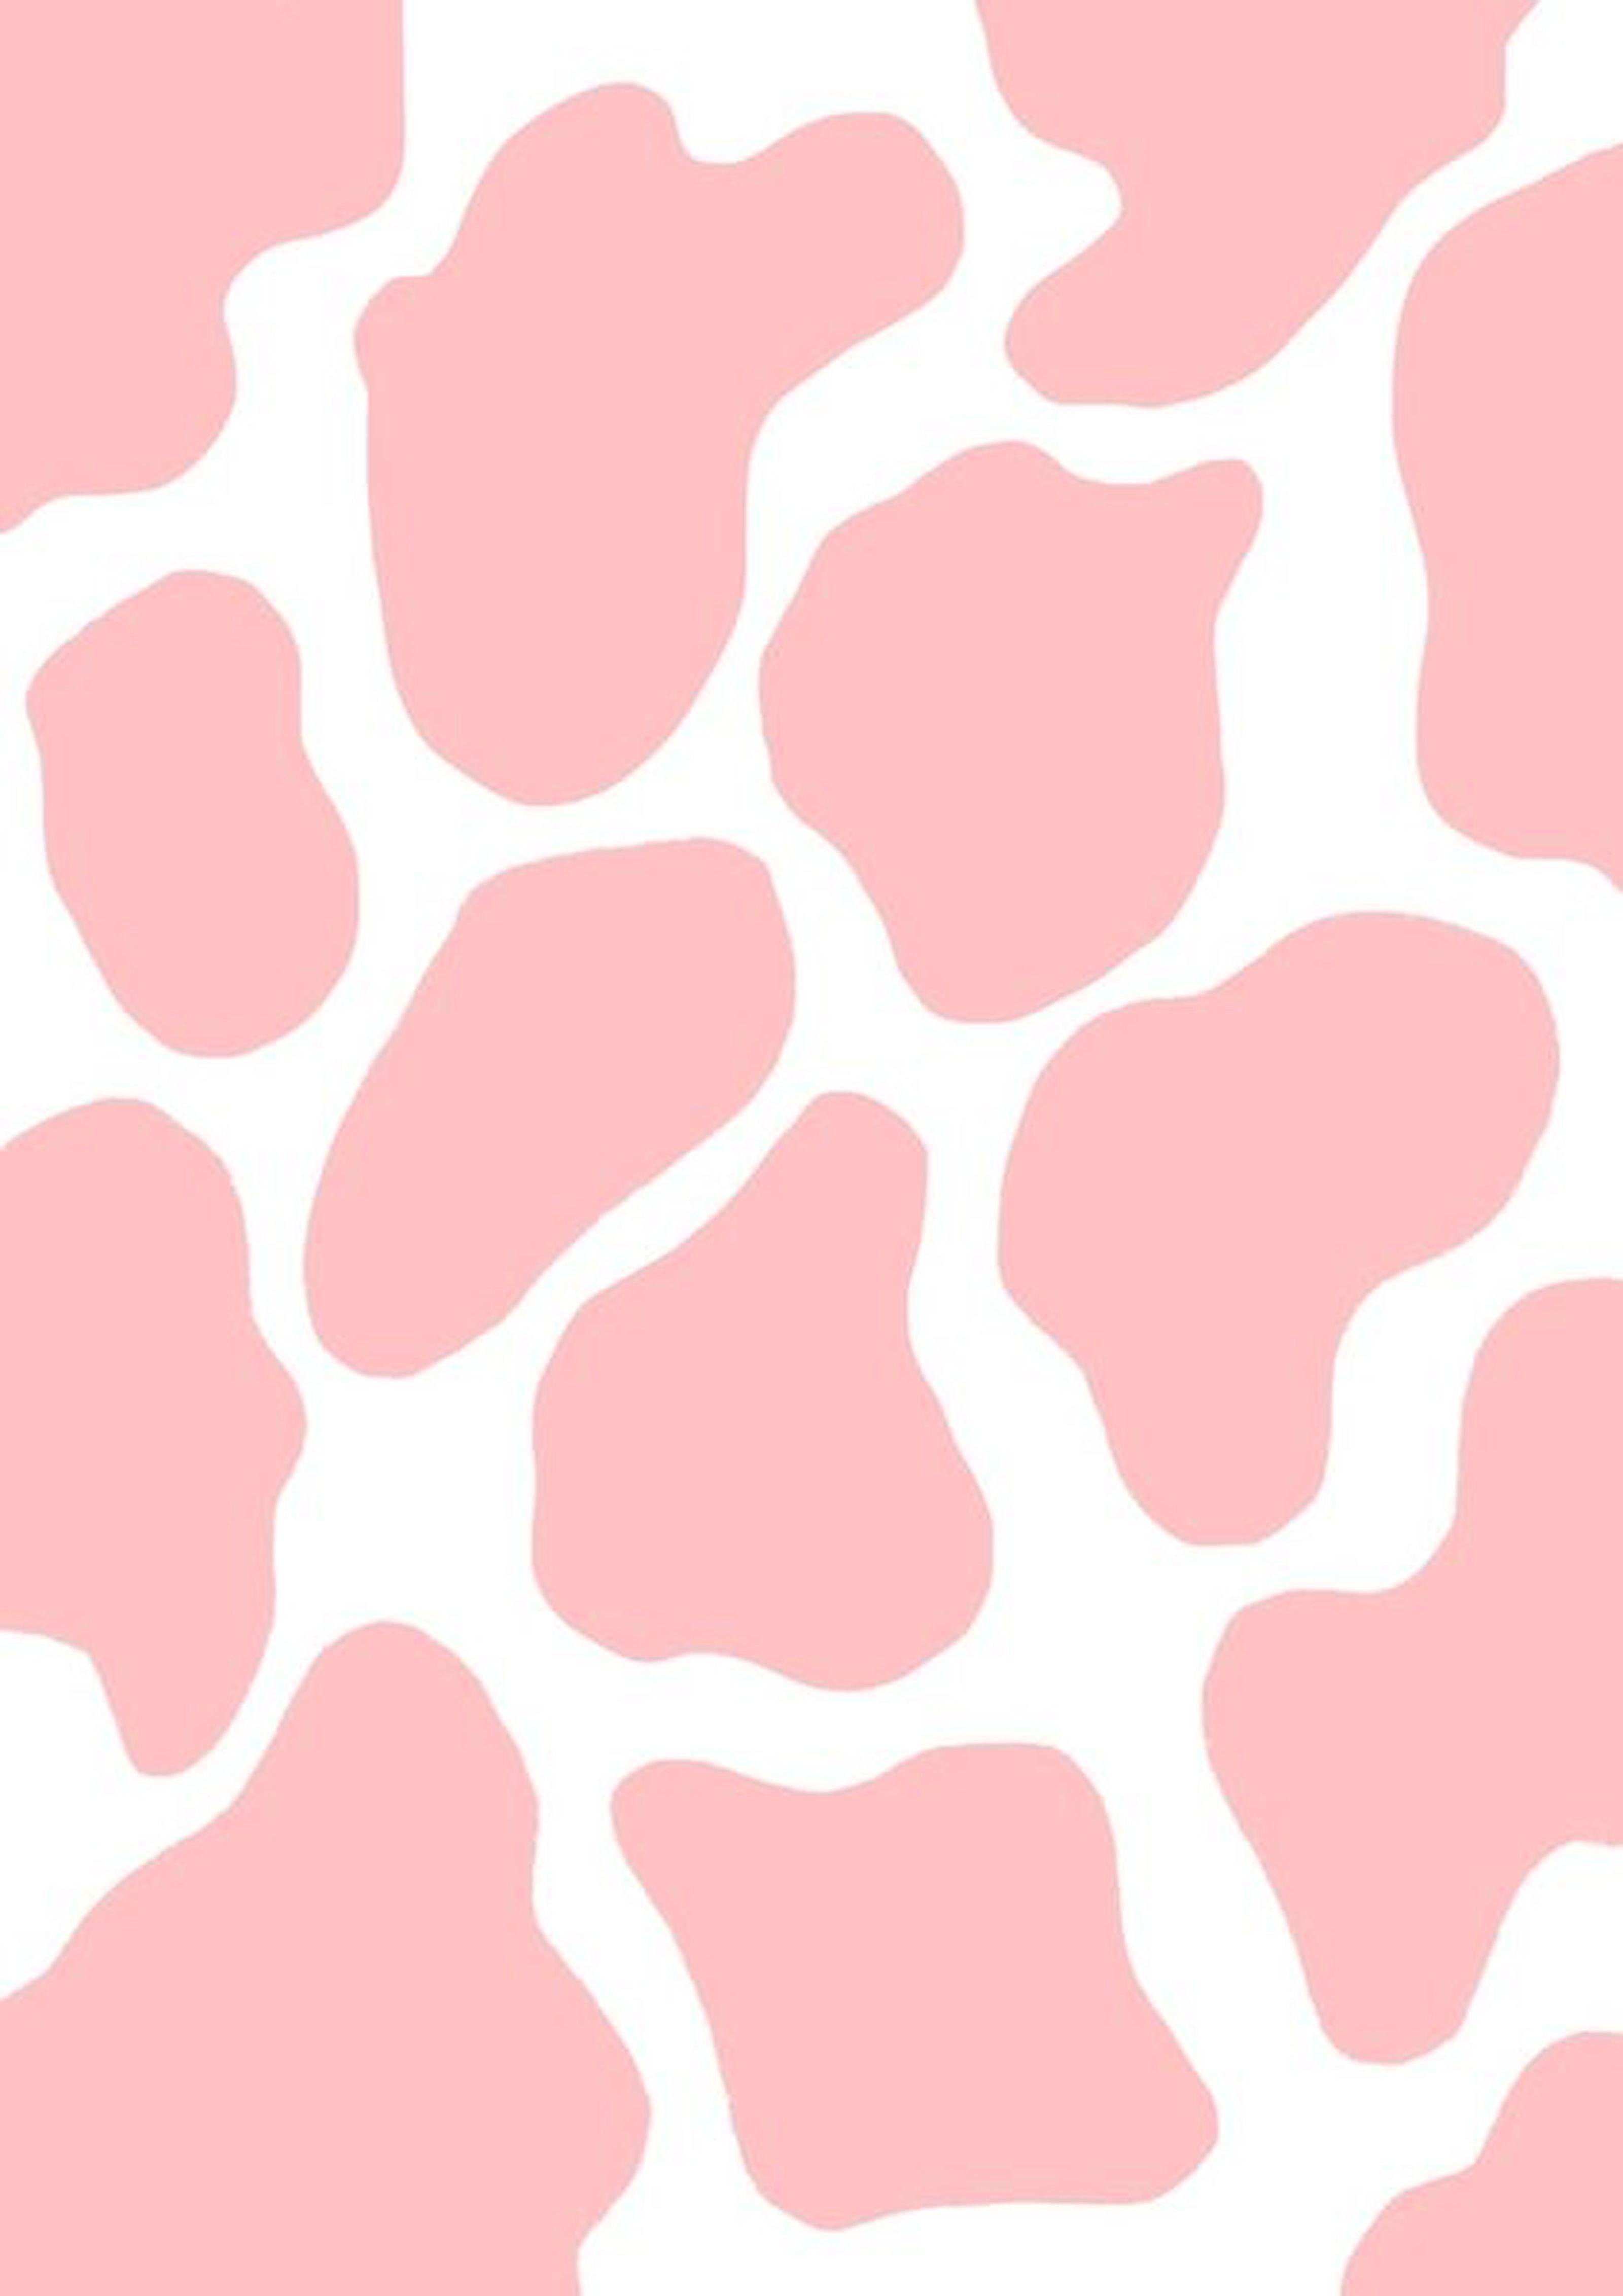 Strawberry Cow Pattern By Patternbabies Redbubble Cow Print Wallpaper Cow Wallpaper Cute Patterns Wallpaper